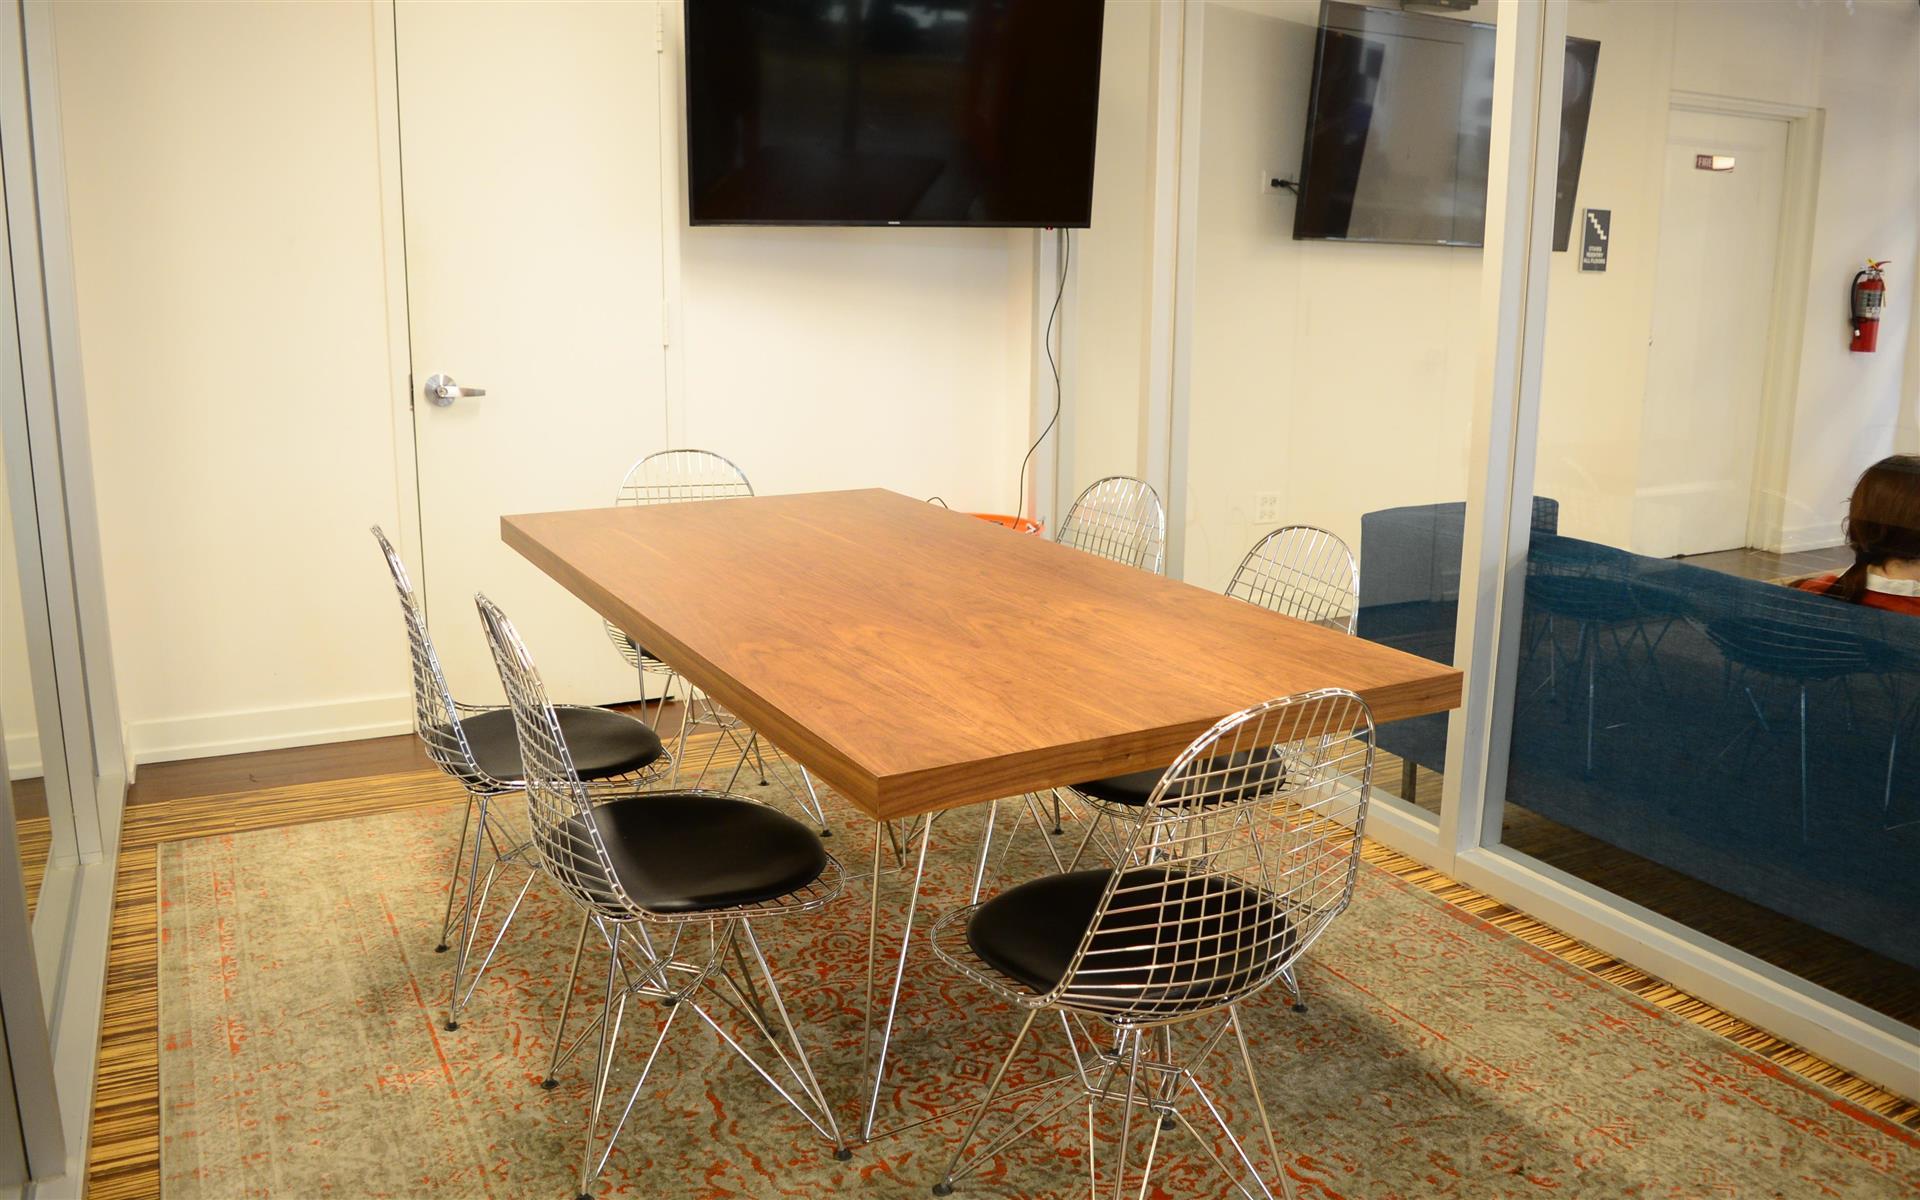 Novel Coworking West Loop - Conference Room 2 at Novel Coworking